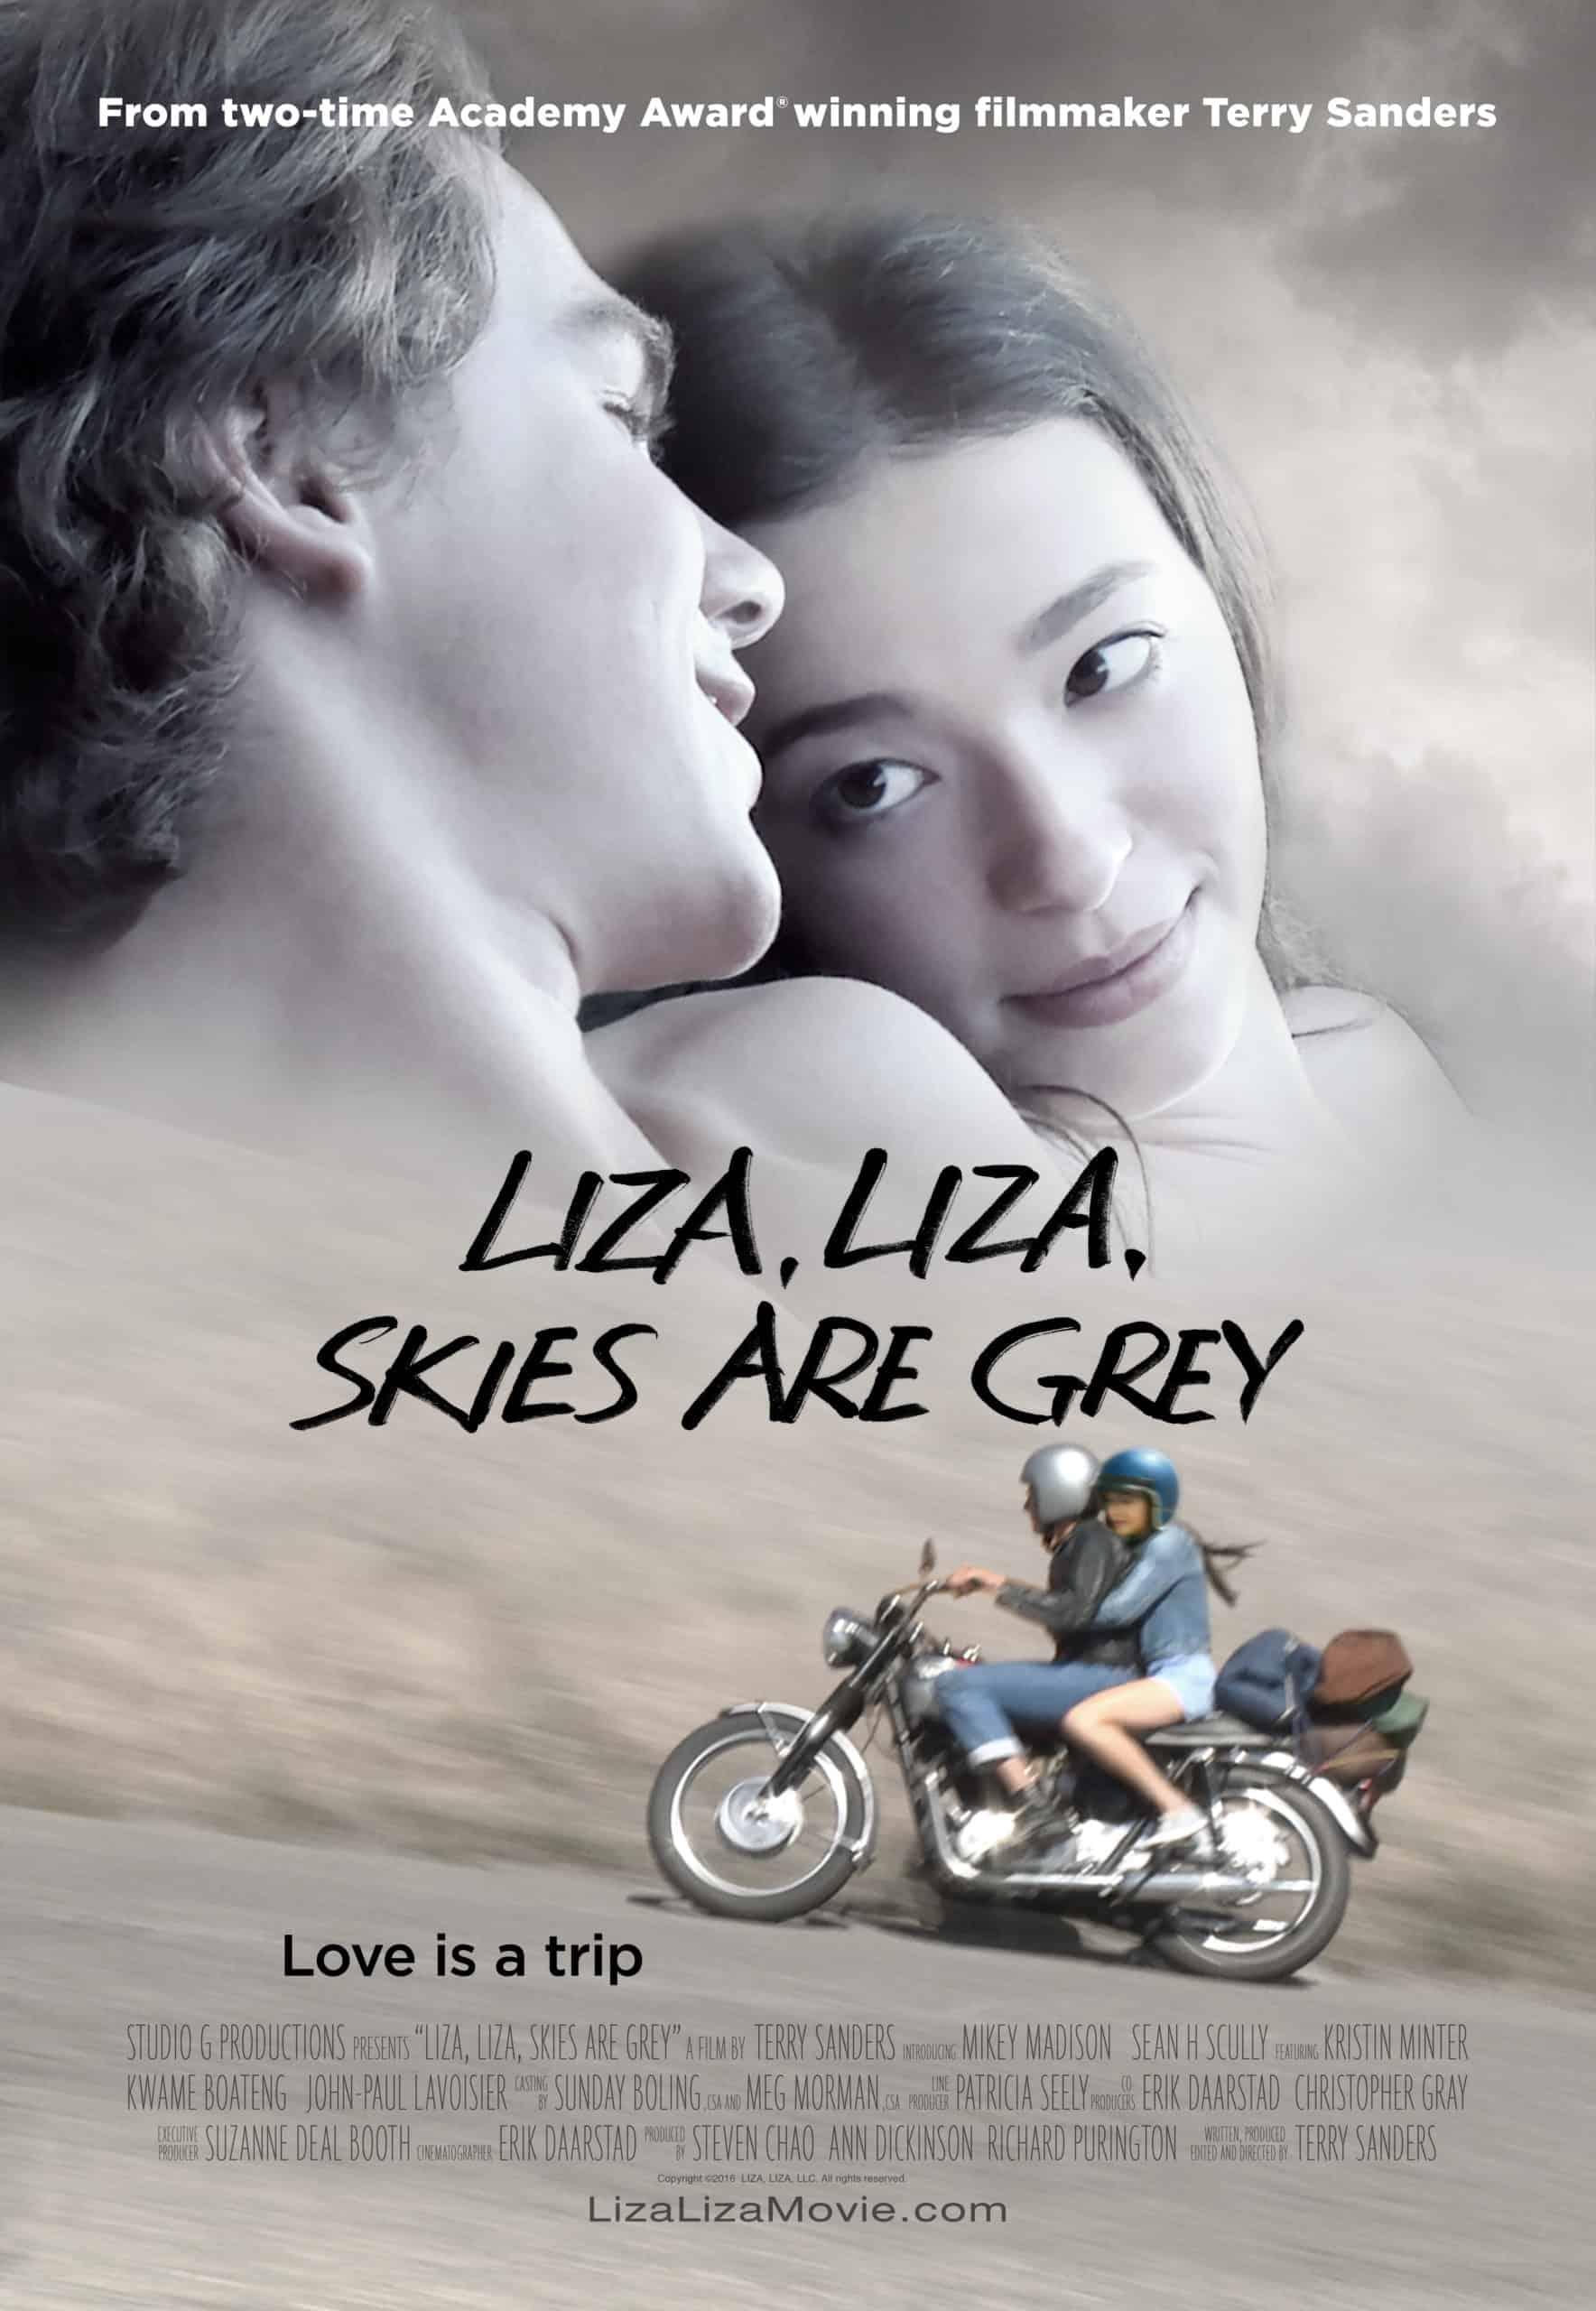 Liza Liza Skies Are Grey movie poster blu-ray streaming digital dvd